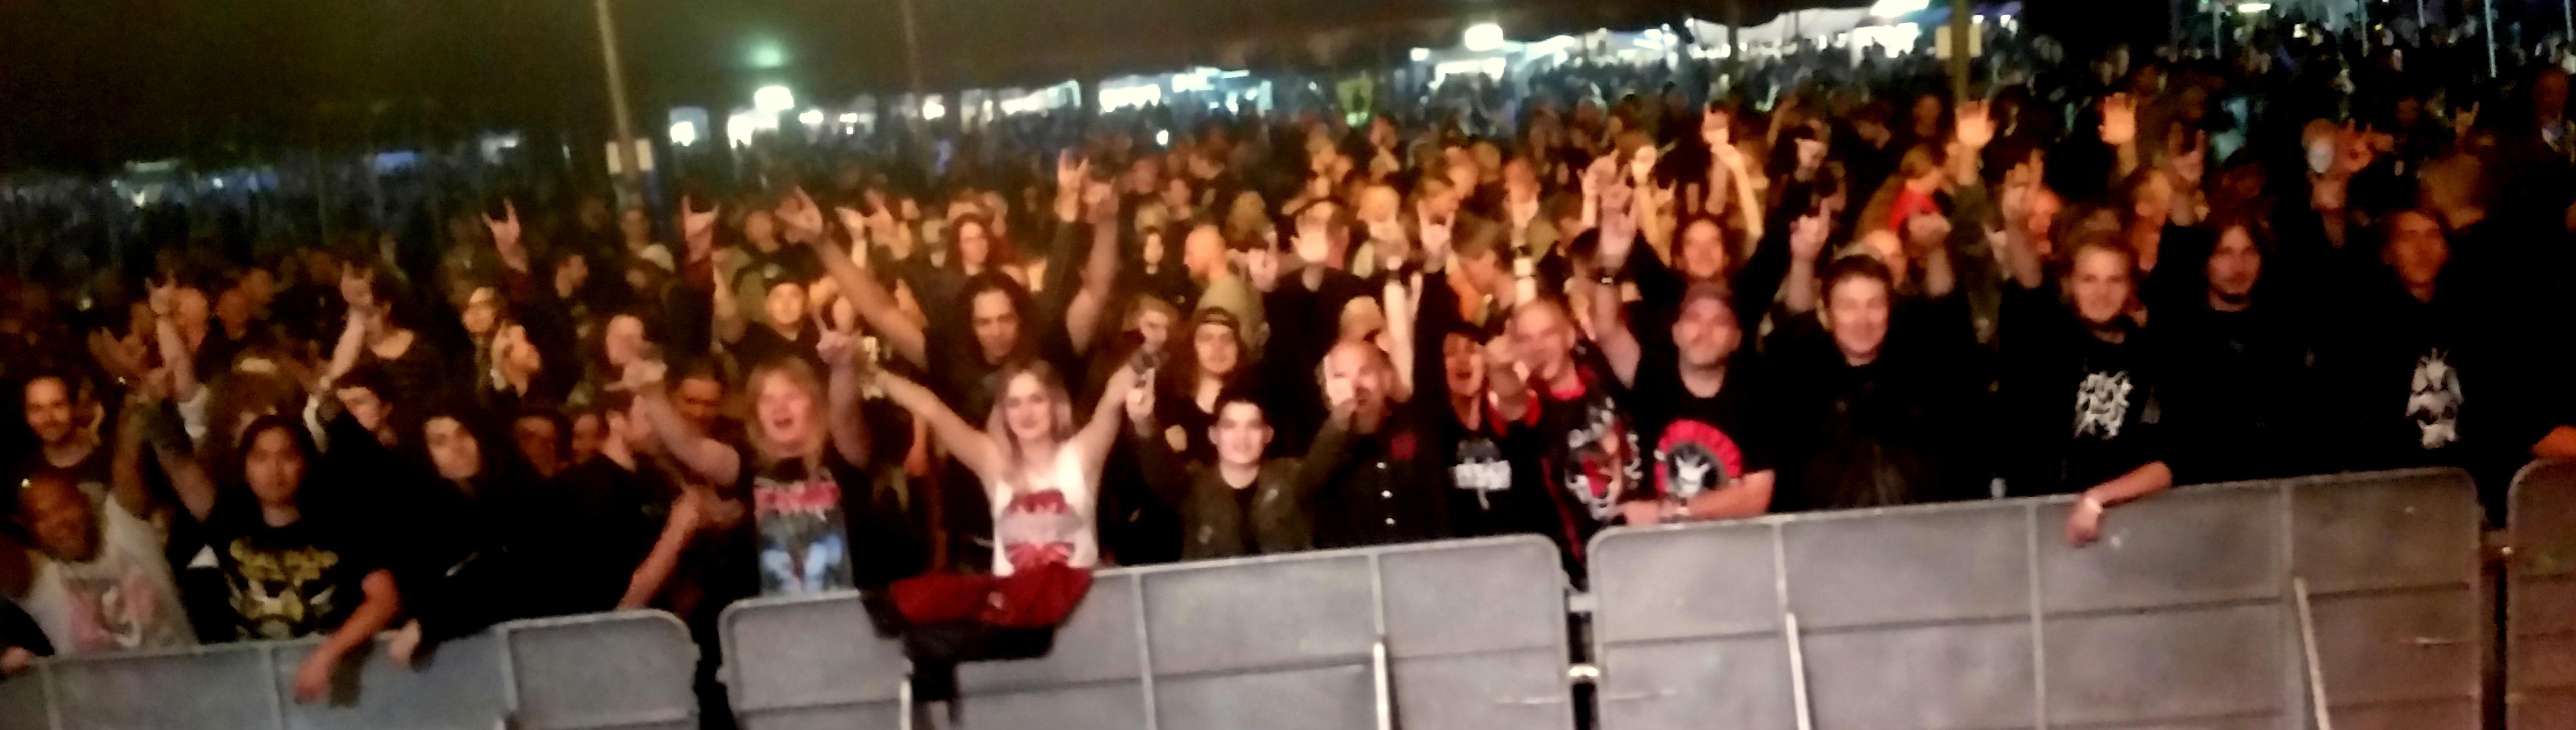 Fans@Rotterdam Baroeg fest